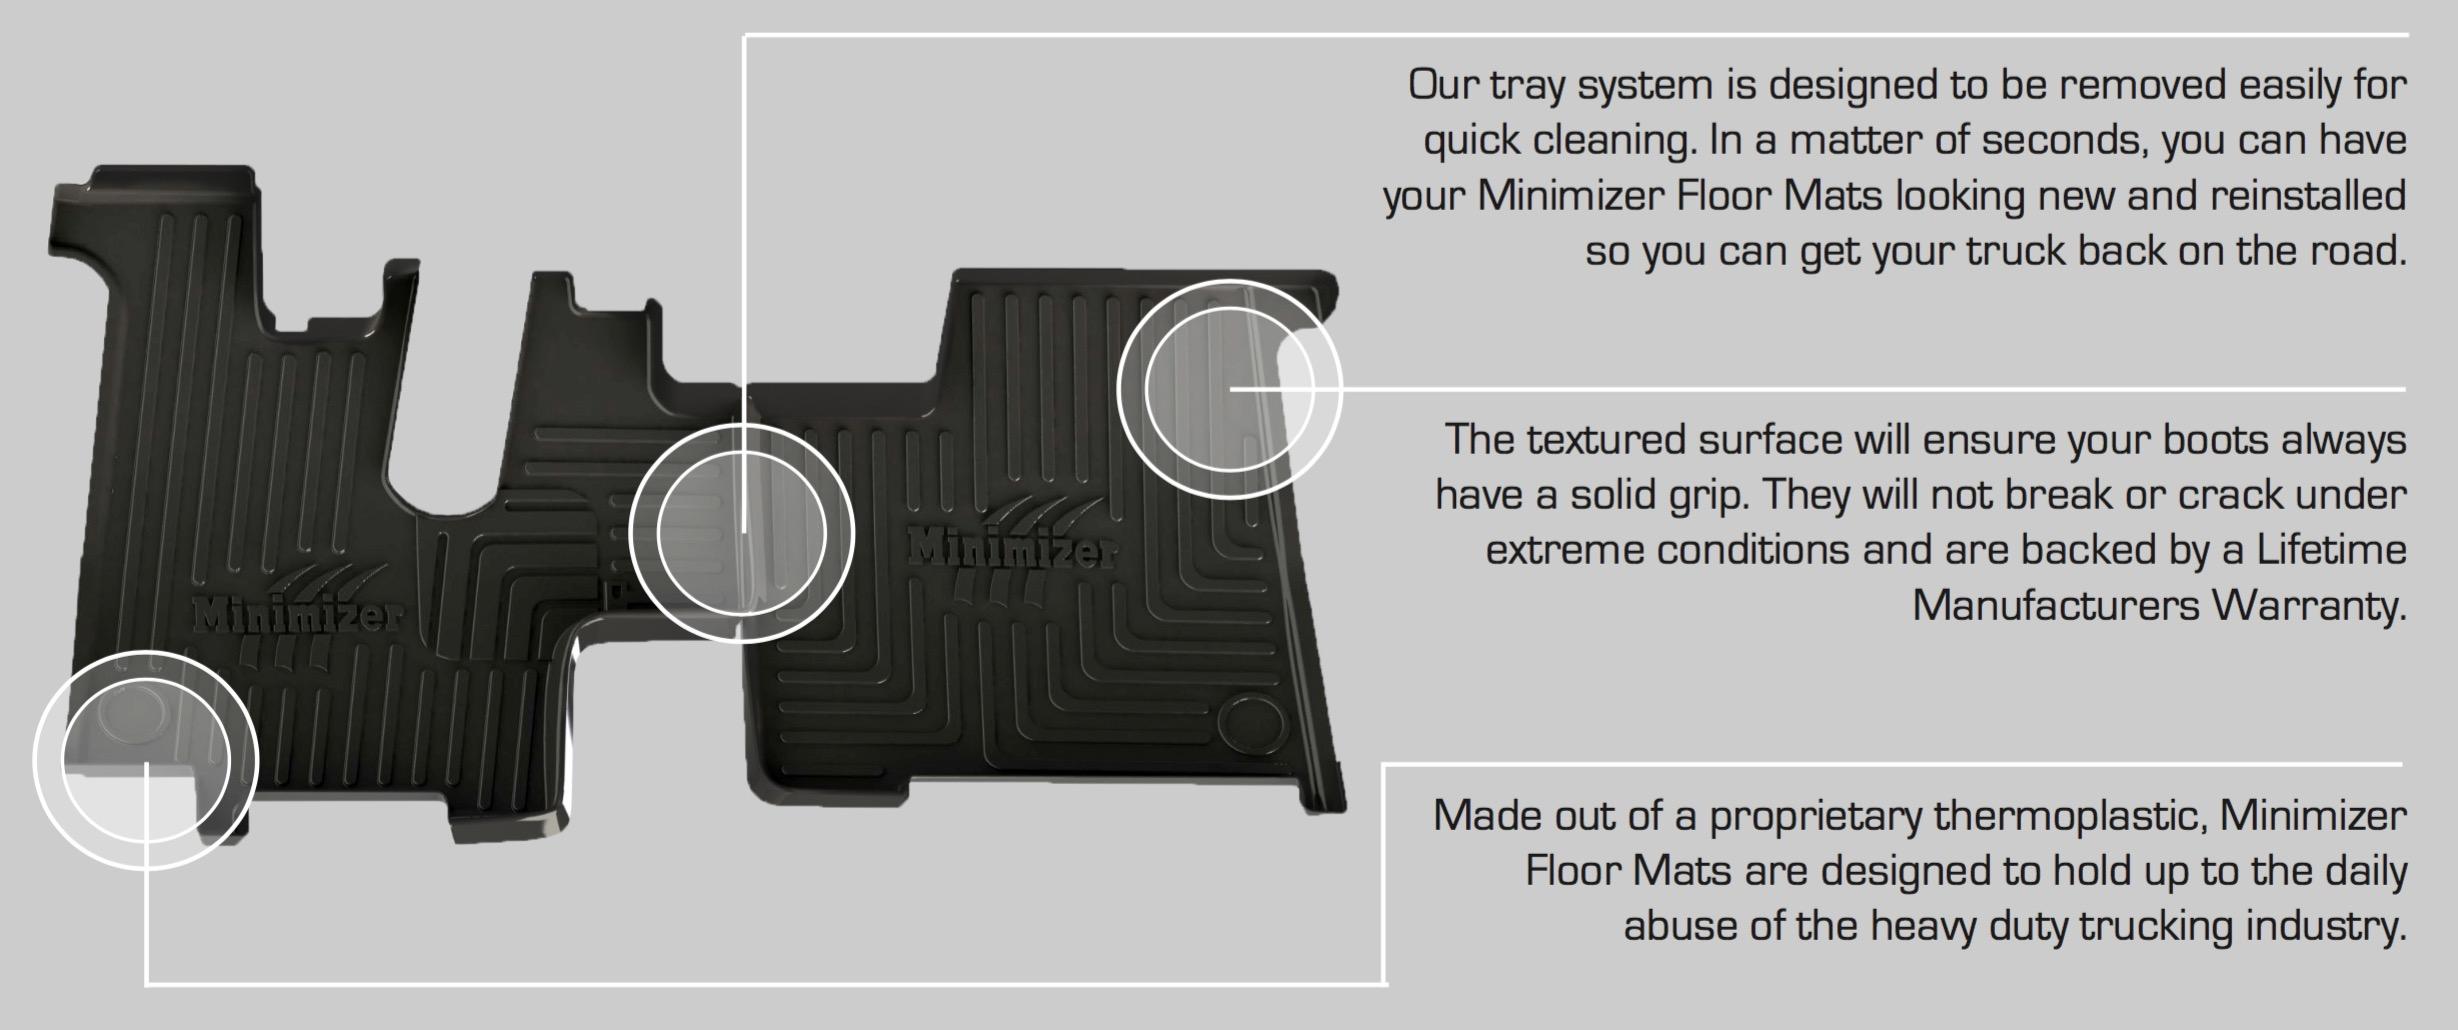 watch minimizer demonstration youtube hqdefault mats floor